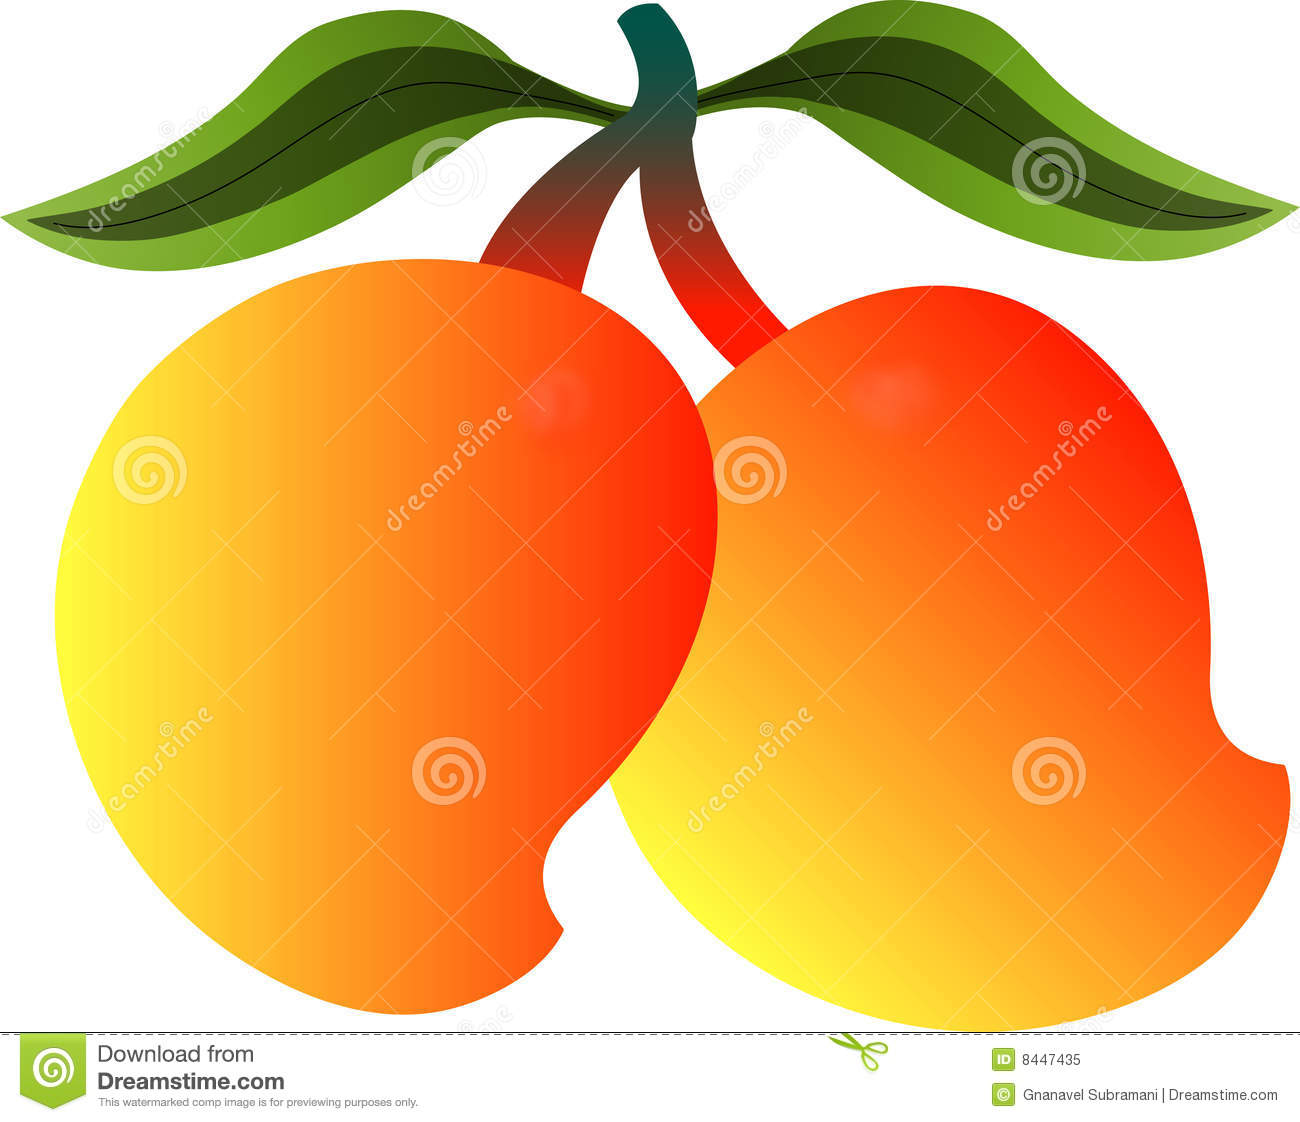 Mango Stock Illustrations.